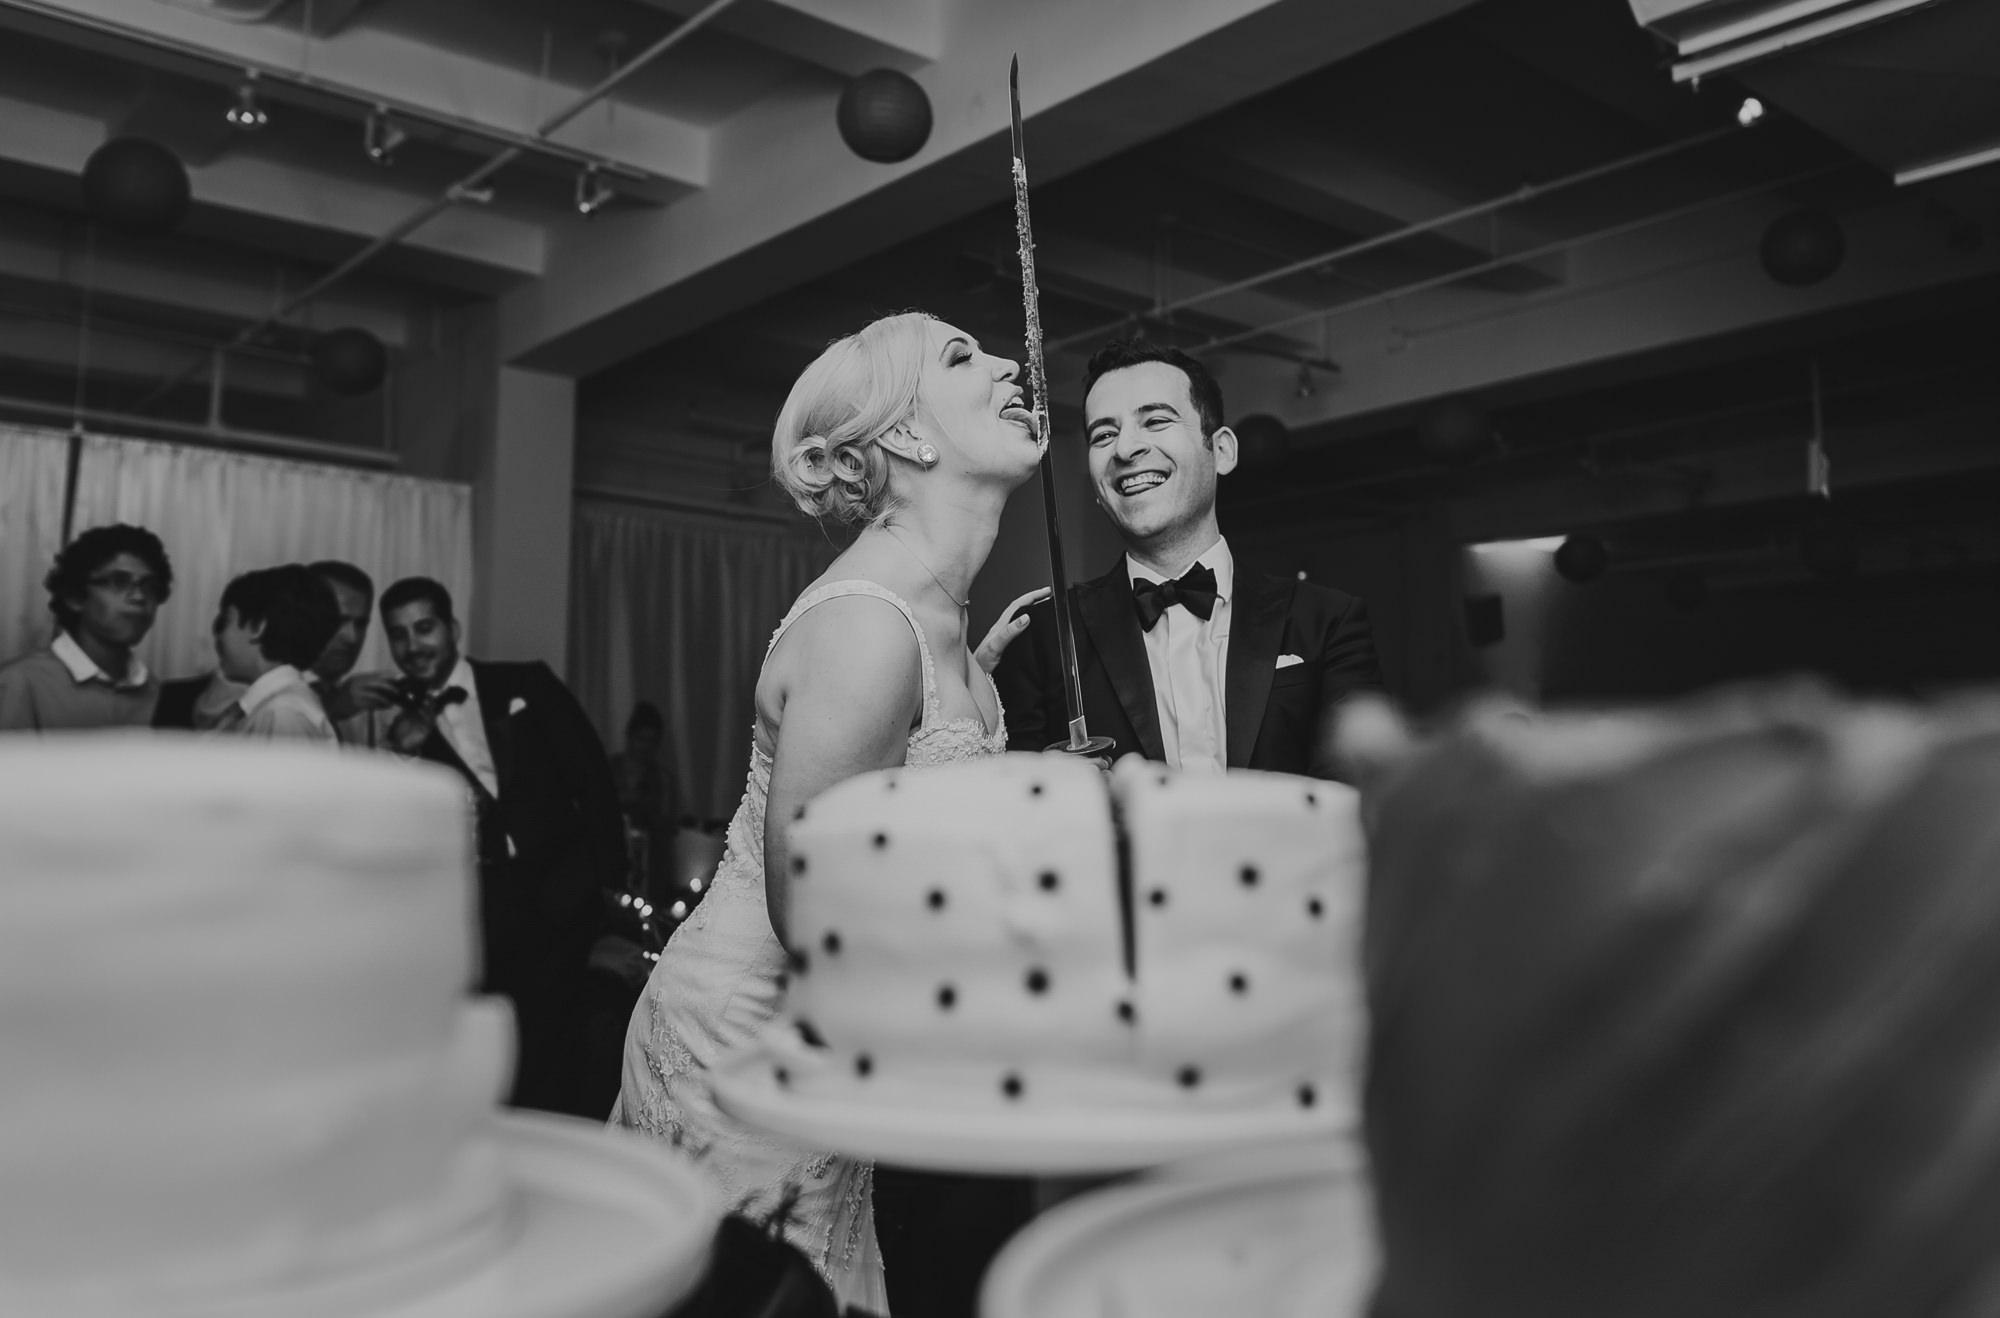 bride-licks-cake=frosting-off-sword-the-brenizers